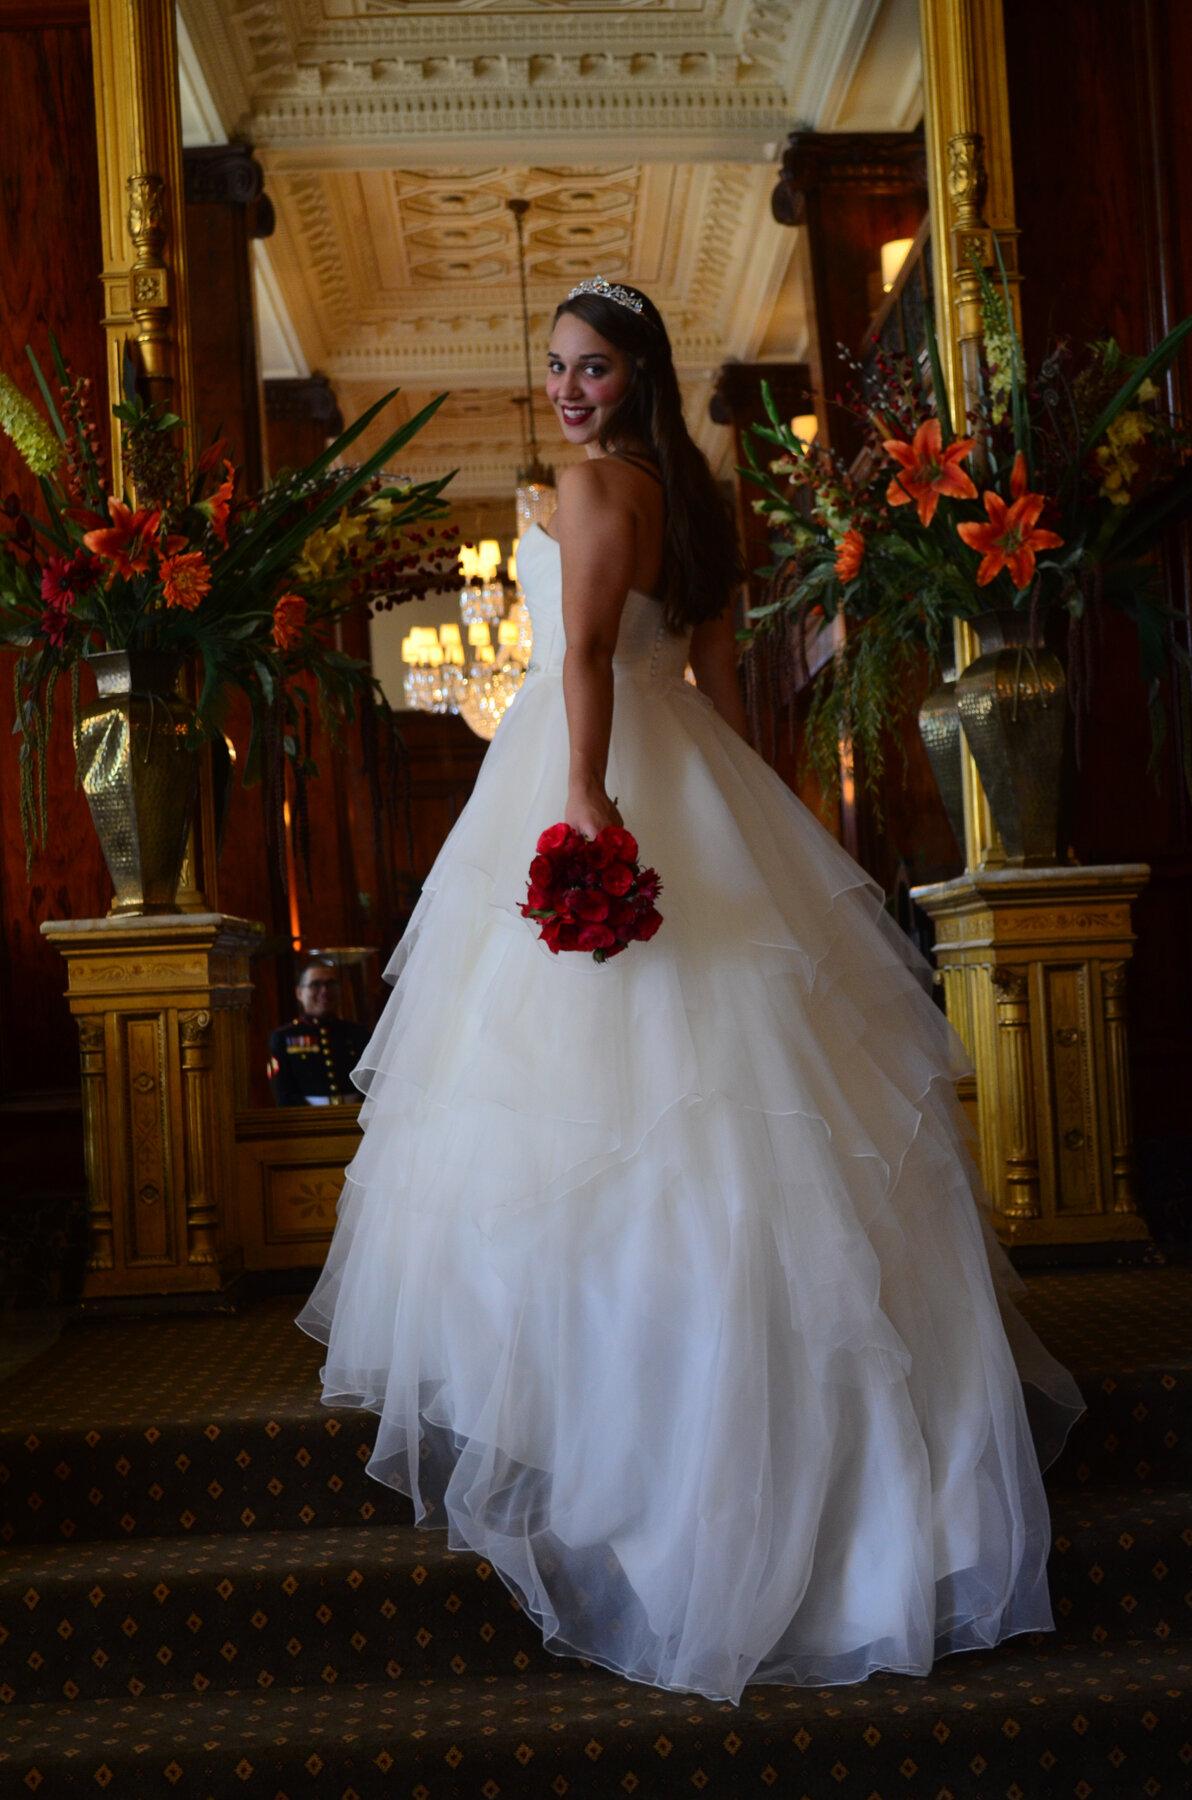 Amanda and Ries' wedding portraits at The Benson Hotel in Portland, Oregon.